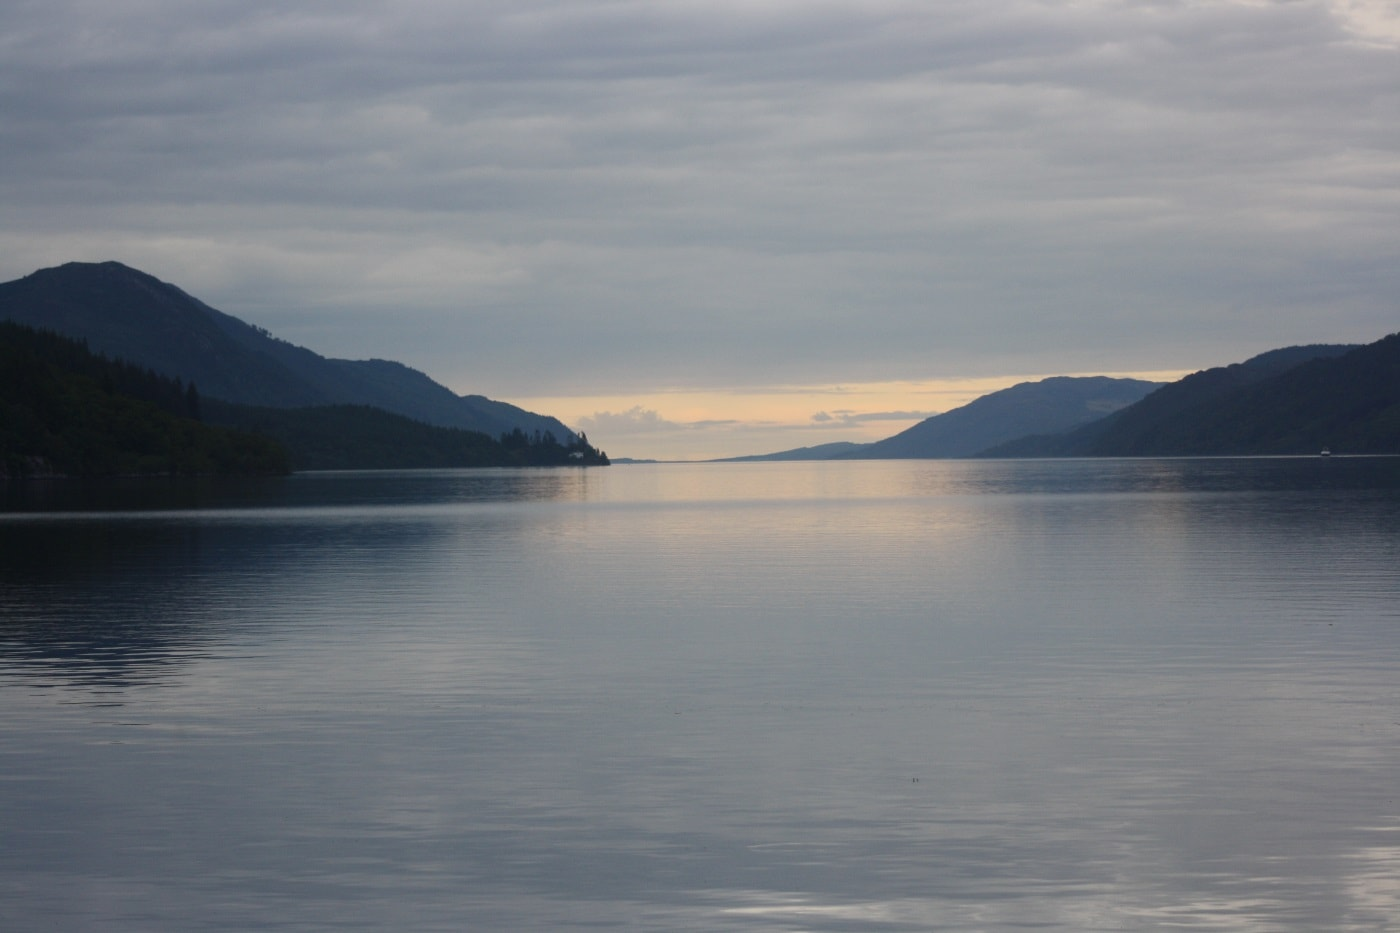 A la rencontre du monstre du Loch Ness en Ecosse